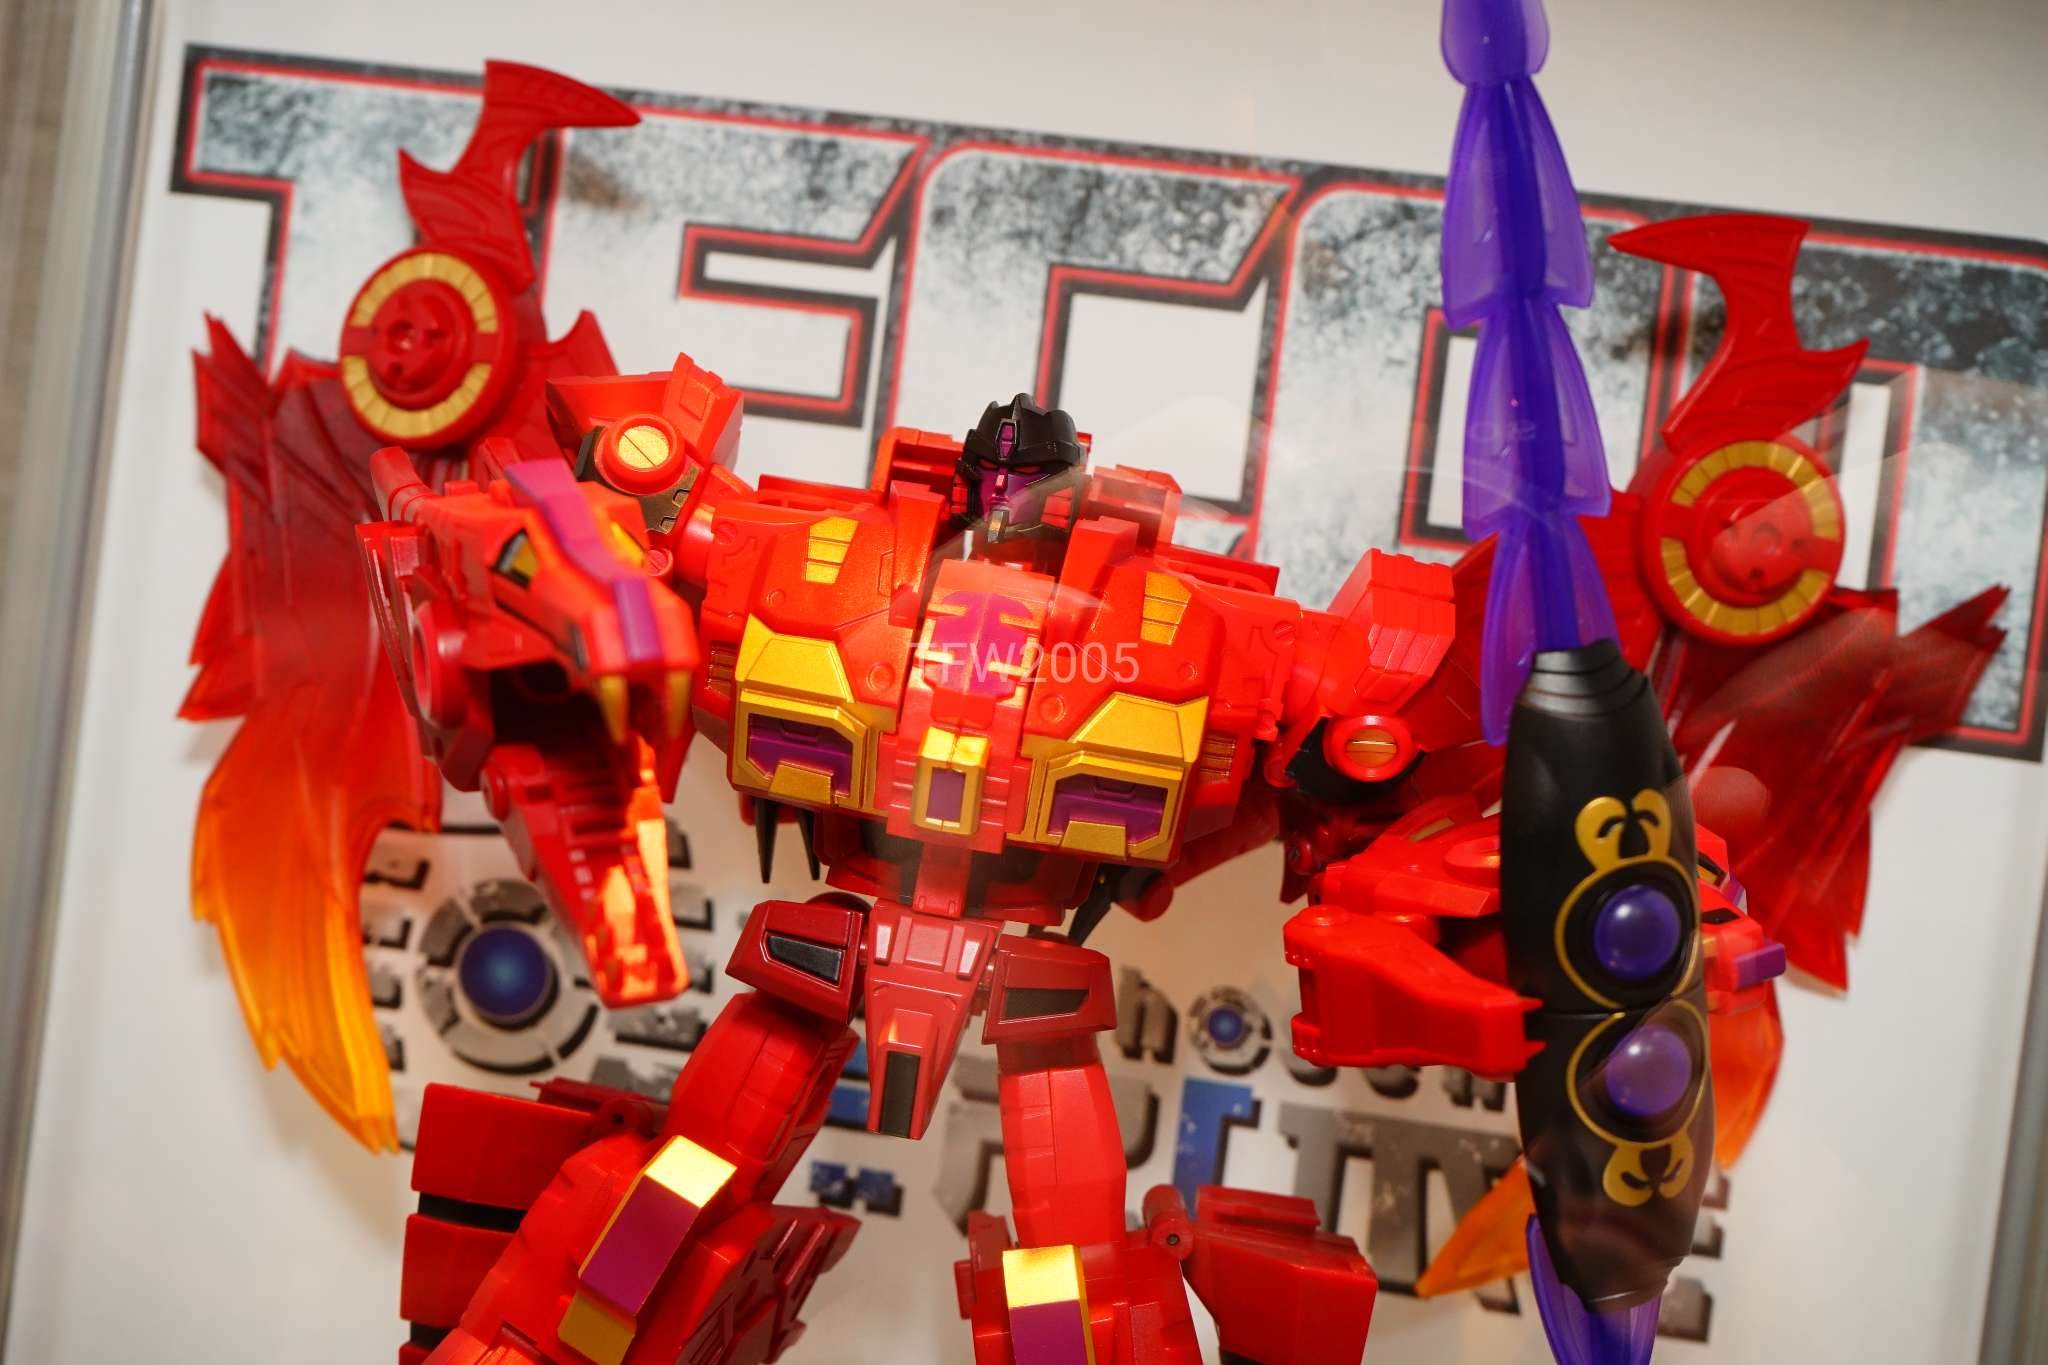 [FansHobby] Produit Tiers - Master Builder MB-03A Red Dragon - aka Transmetal 2 Mégatron (Beast Wars S3) MRf30a35_o